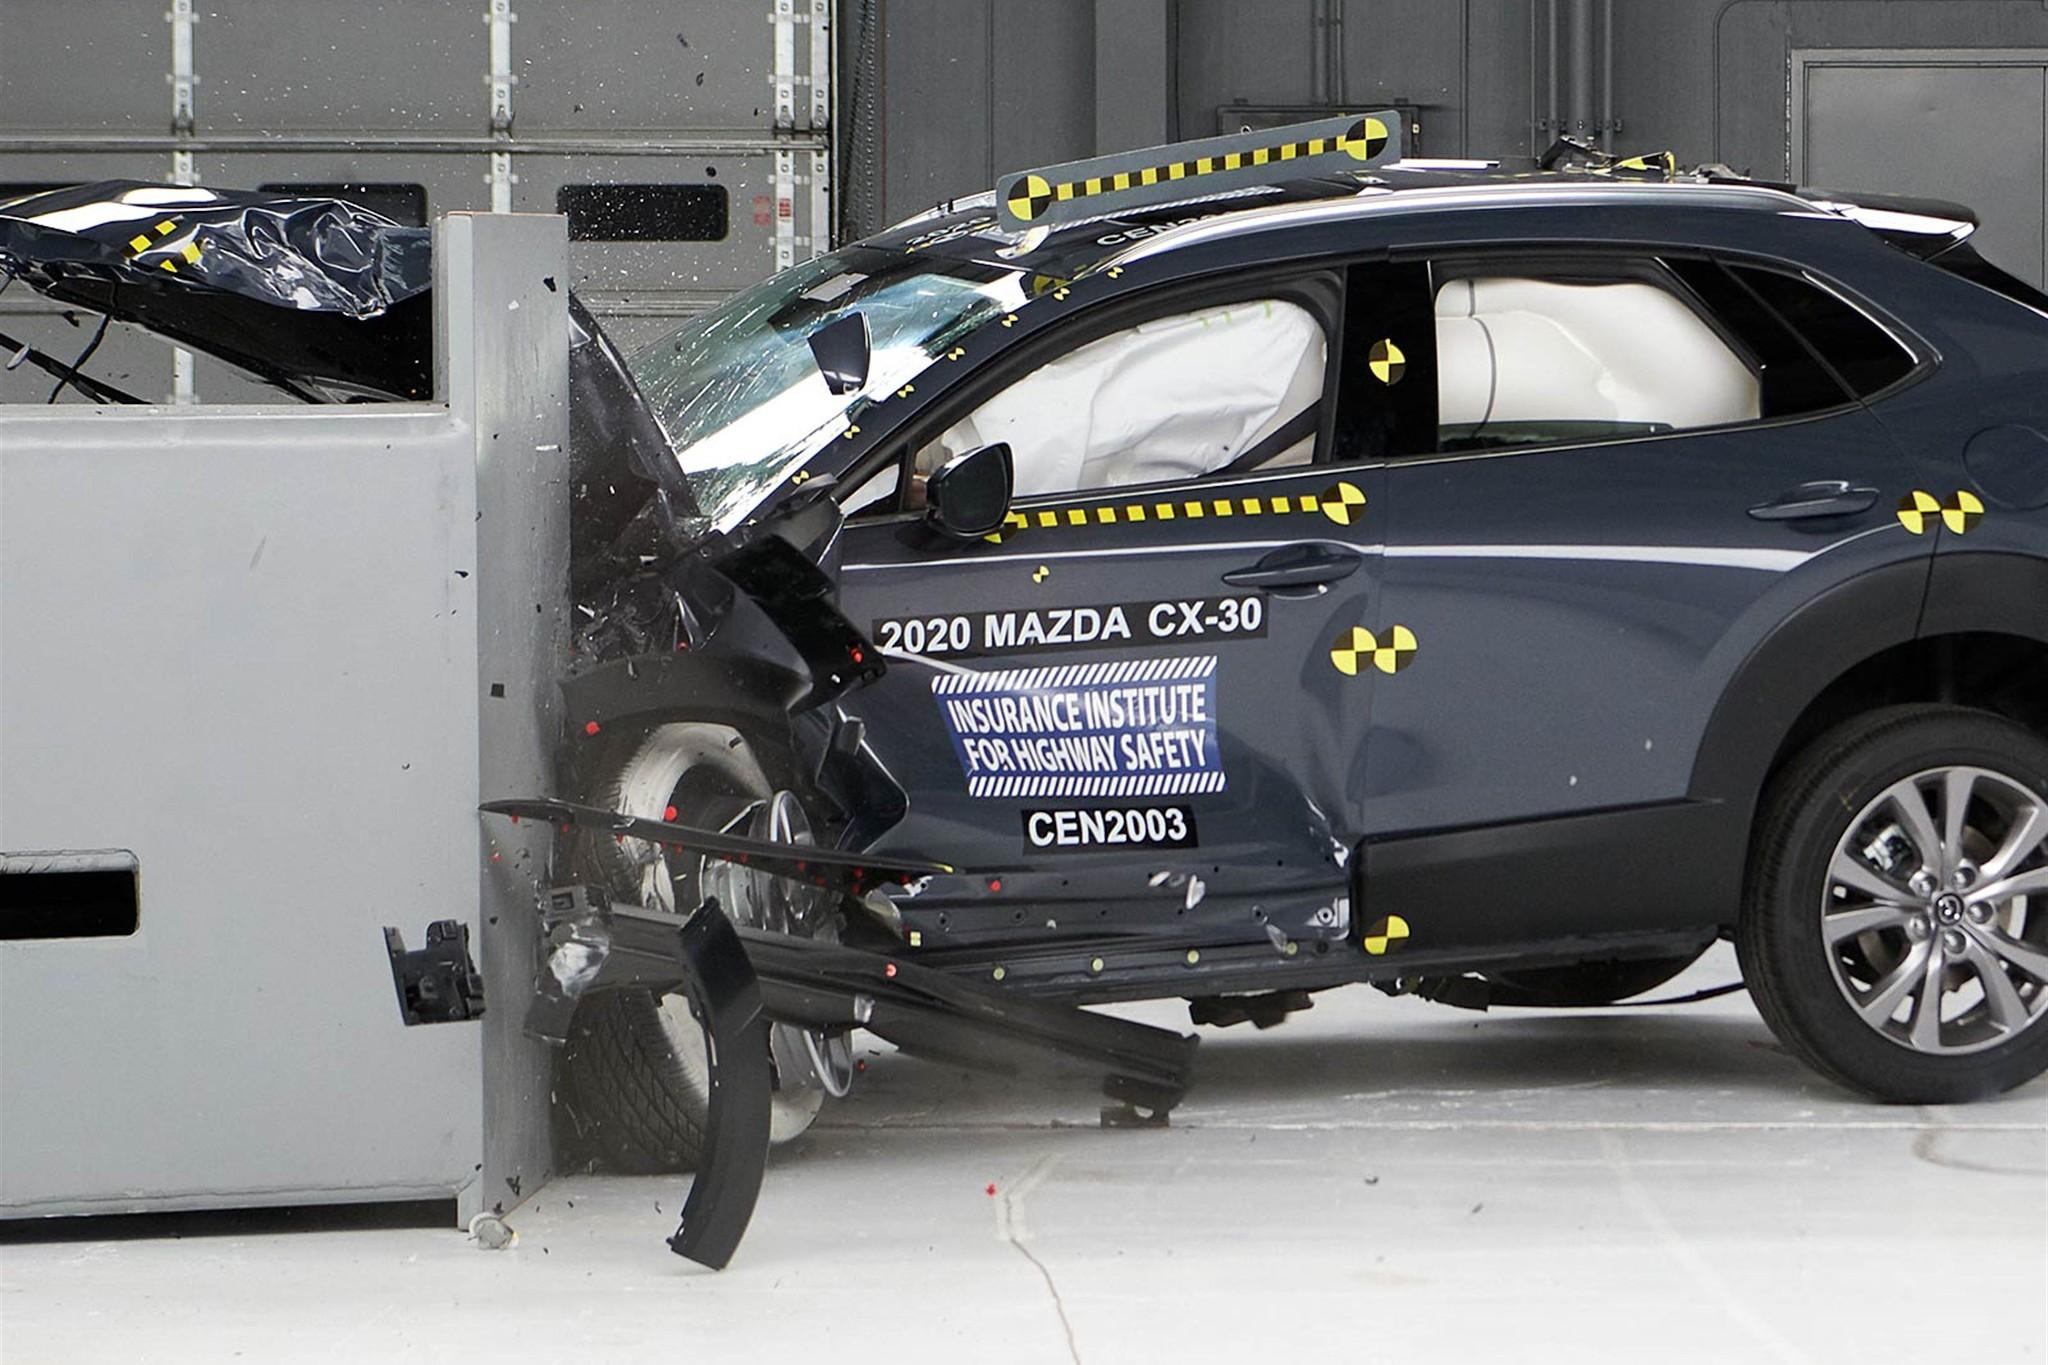 2020 Mazda CX-30 Earns Top Honors in Crash Testing